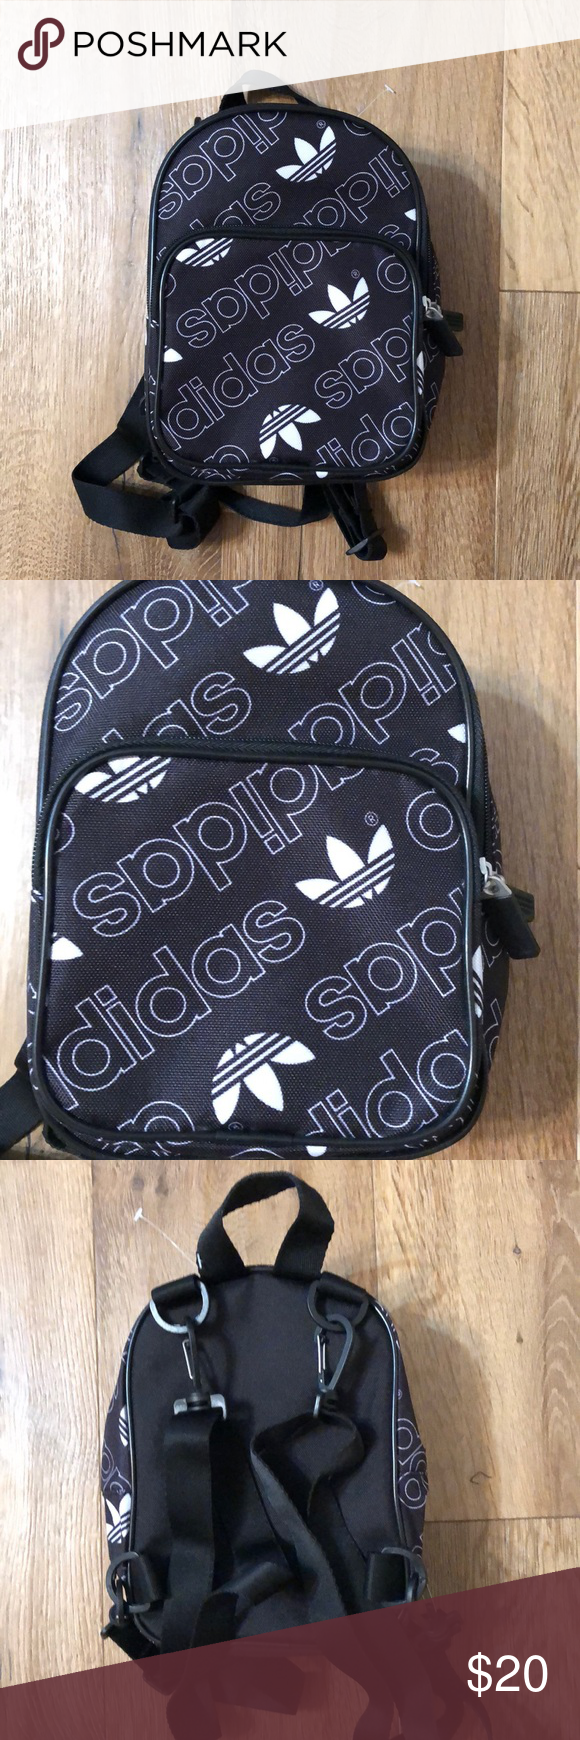 c38aac2e5952 adidas Originals BP CL AC XS GR backpack Brand new